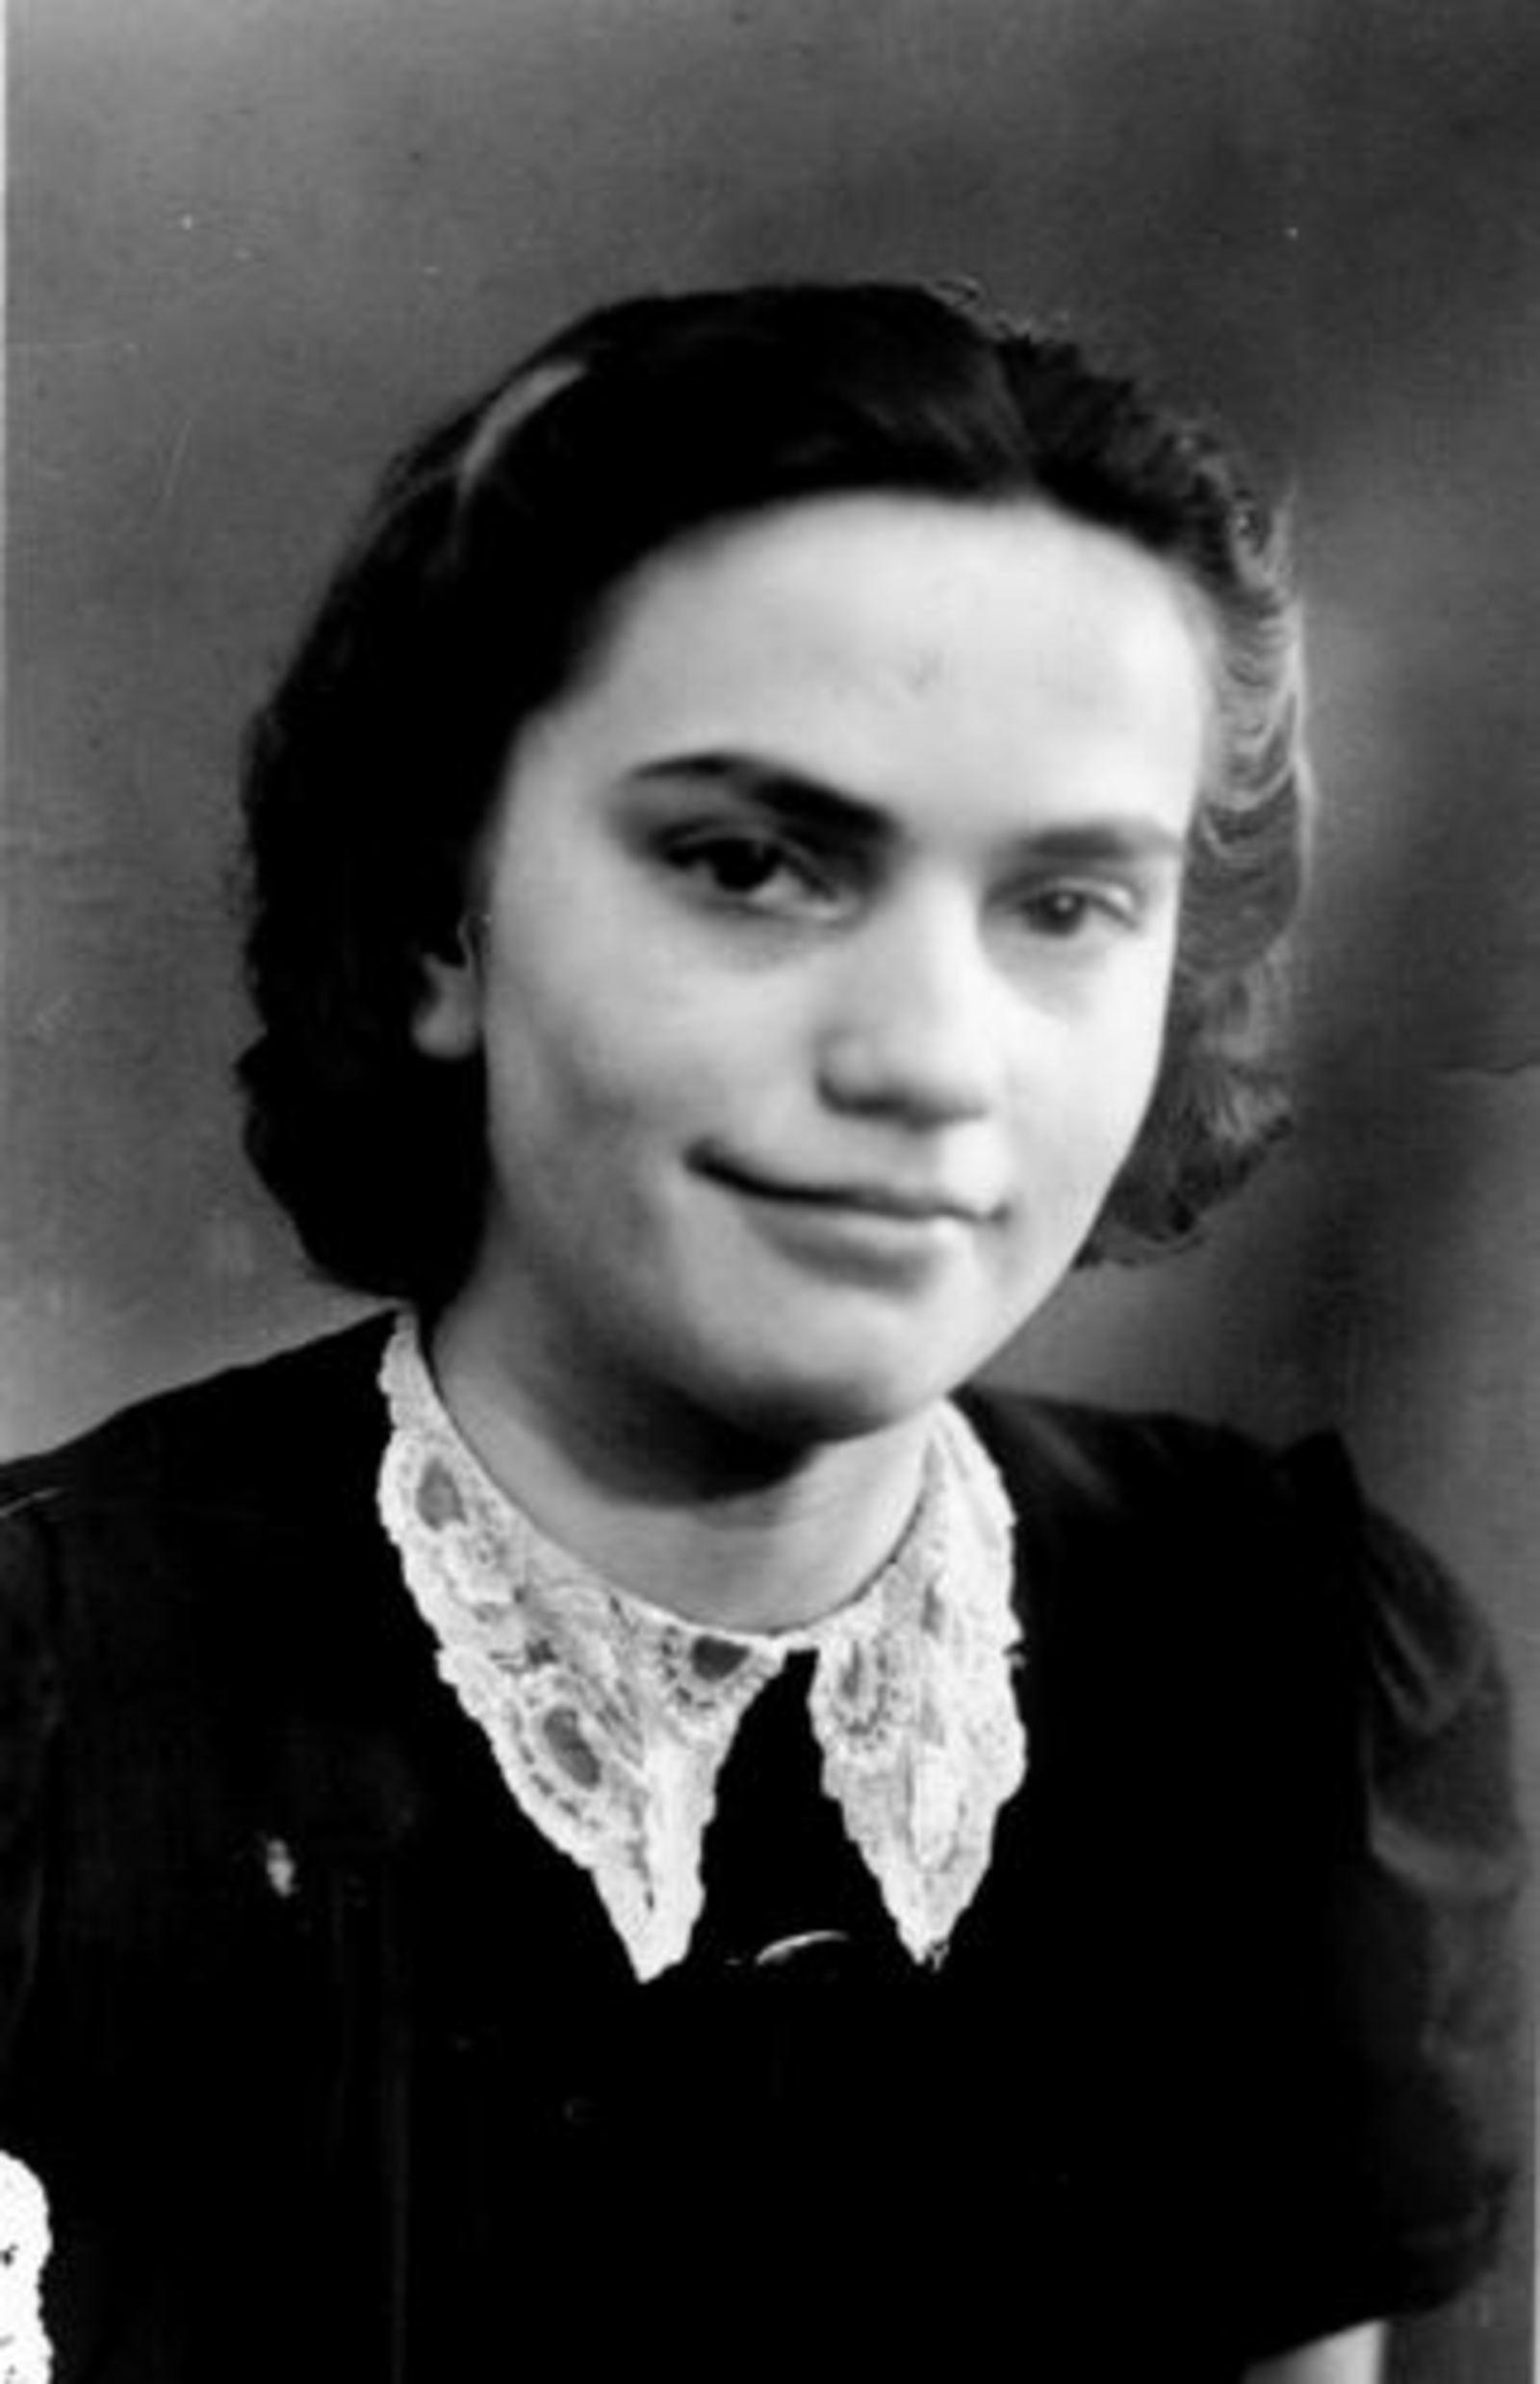 21 Wies Maria Pdr 1899 1945± Portret dochter Elisabeth Swier